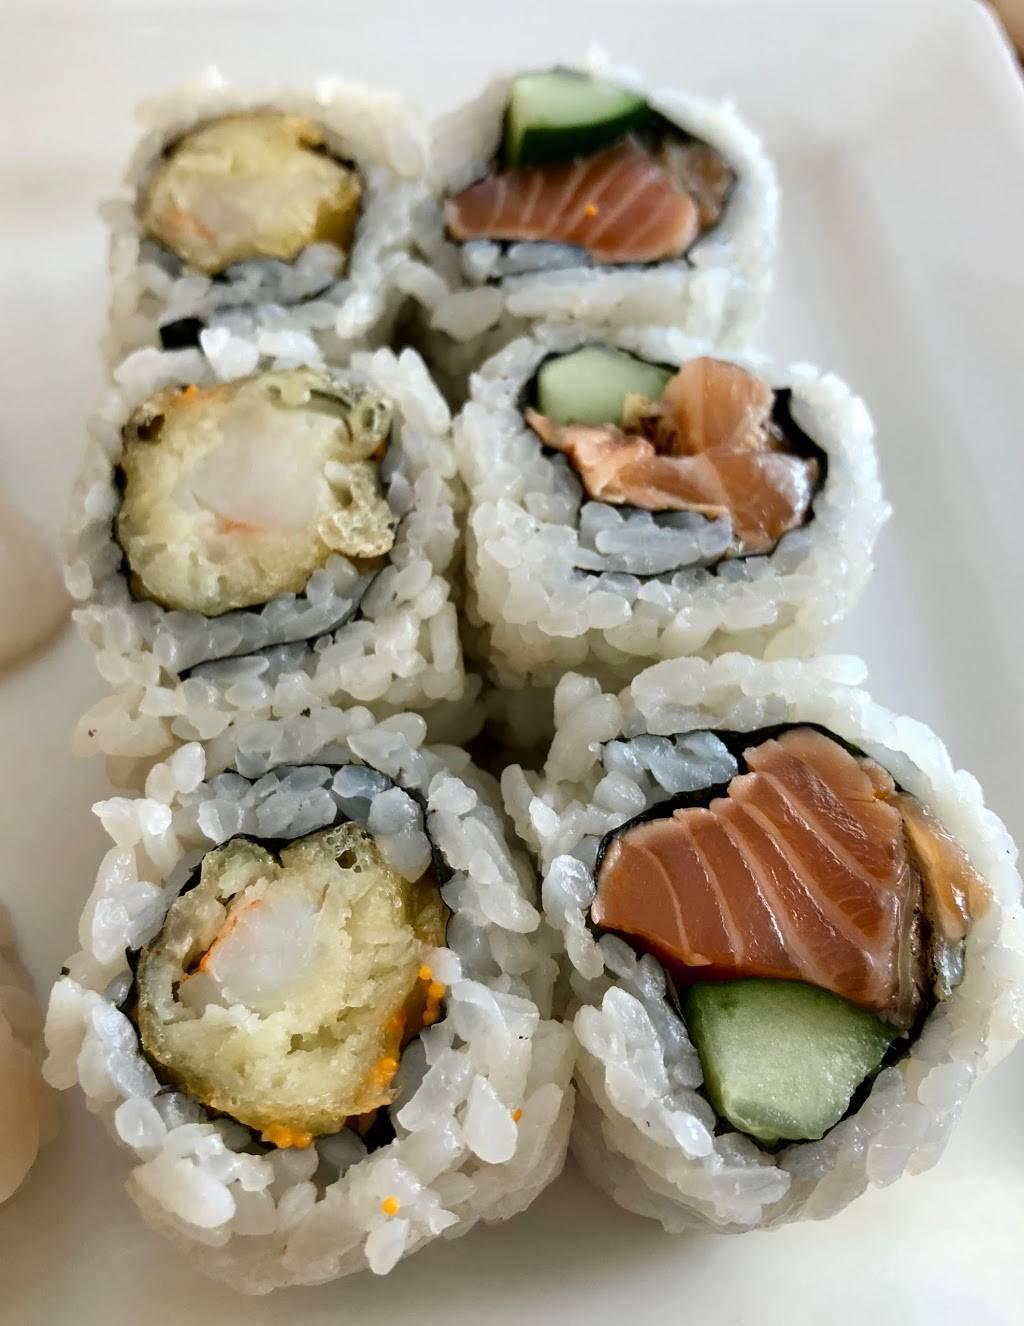 Sushi of Gari   restaurant   130 W Broadway, New York, NY 10013, USA   2122850130 OR +1 212-285-0130